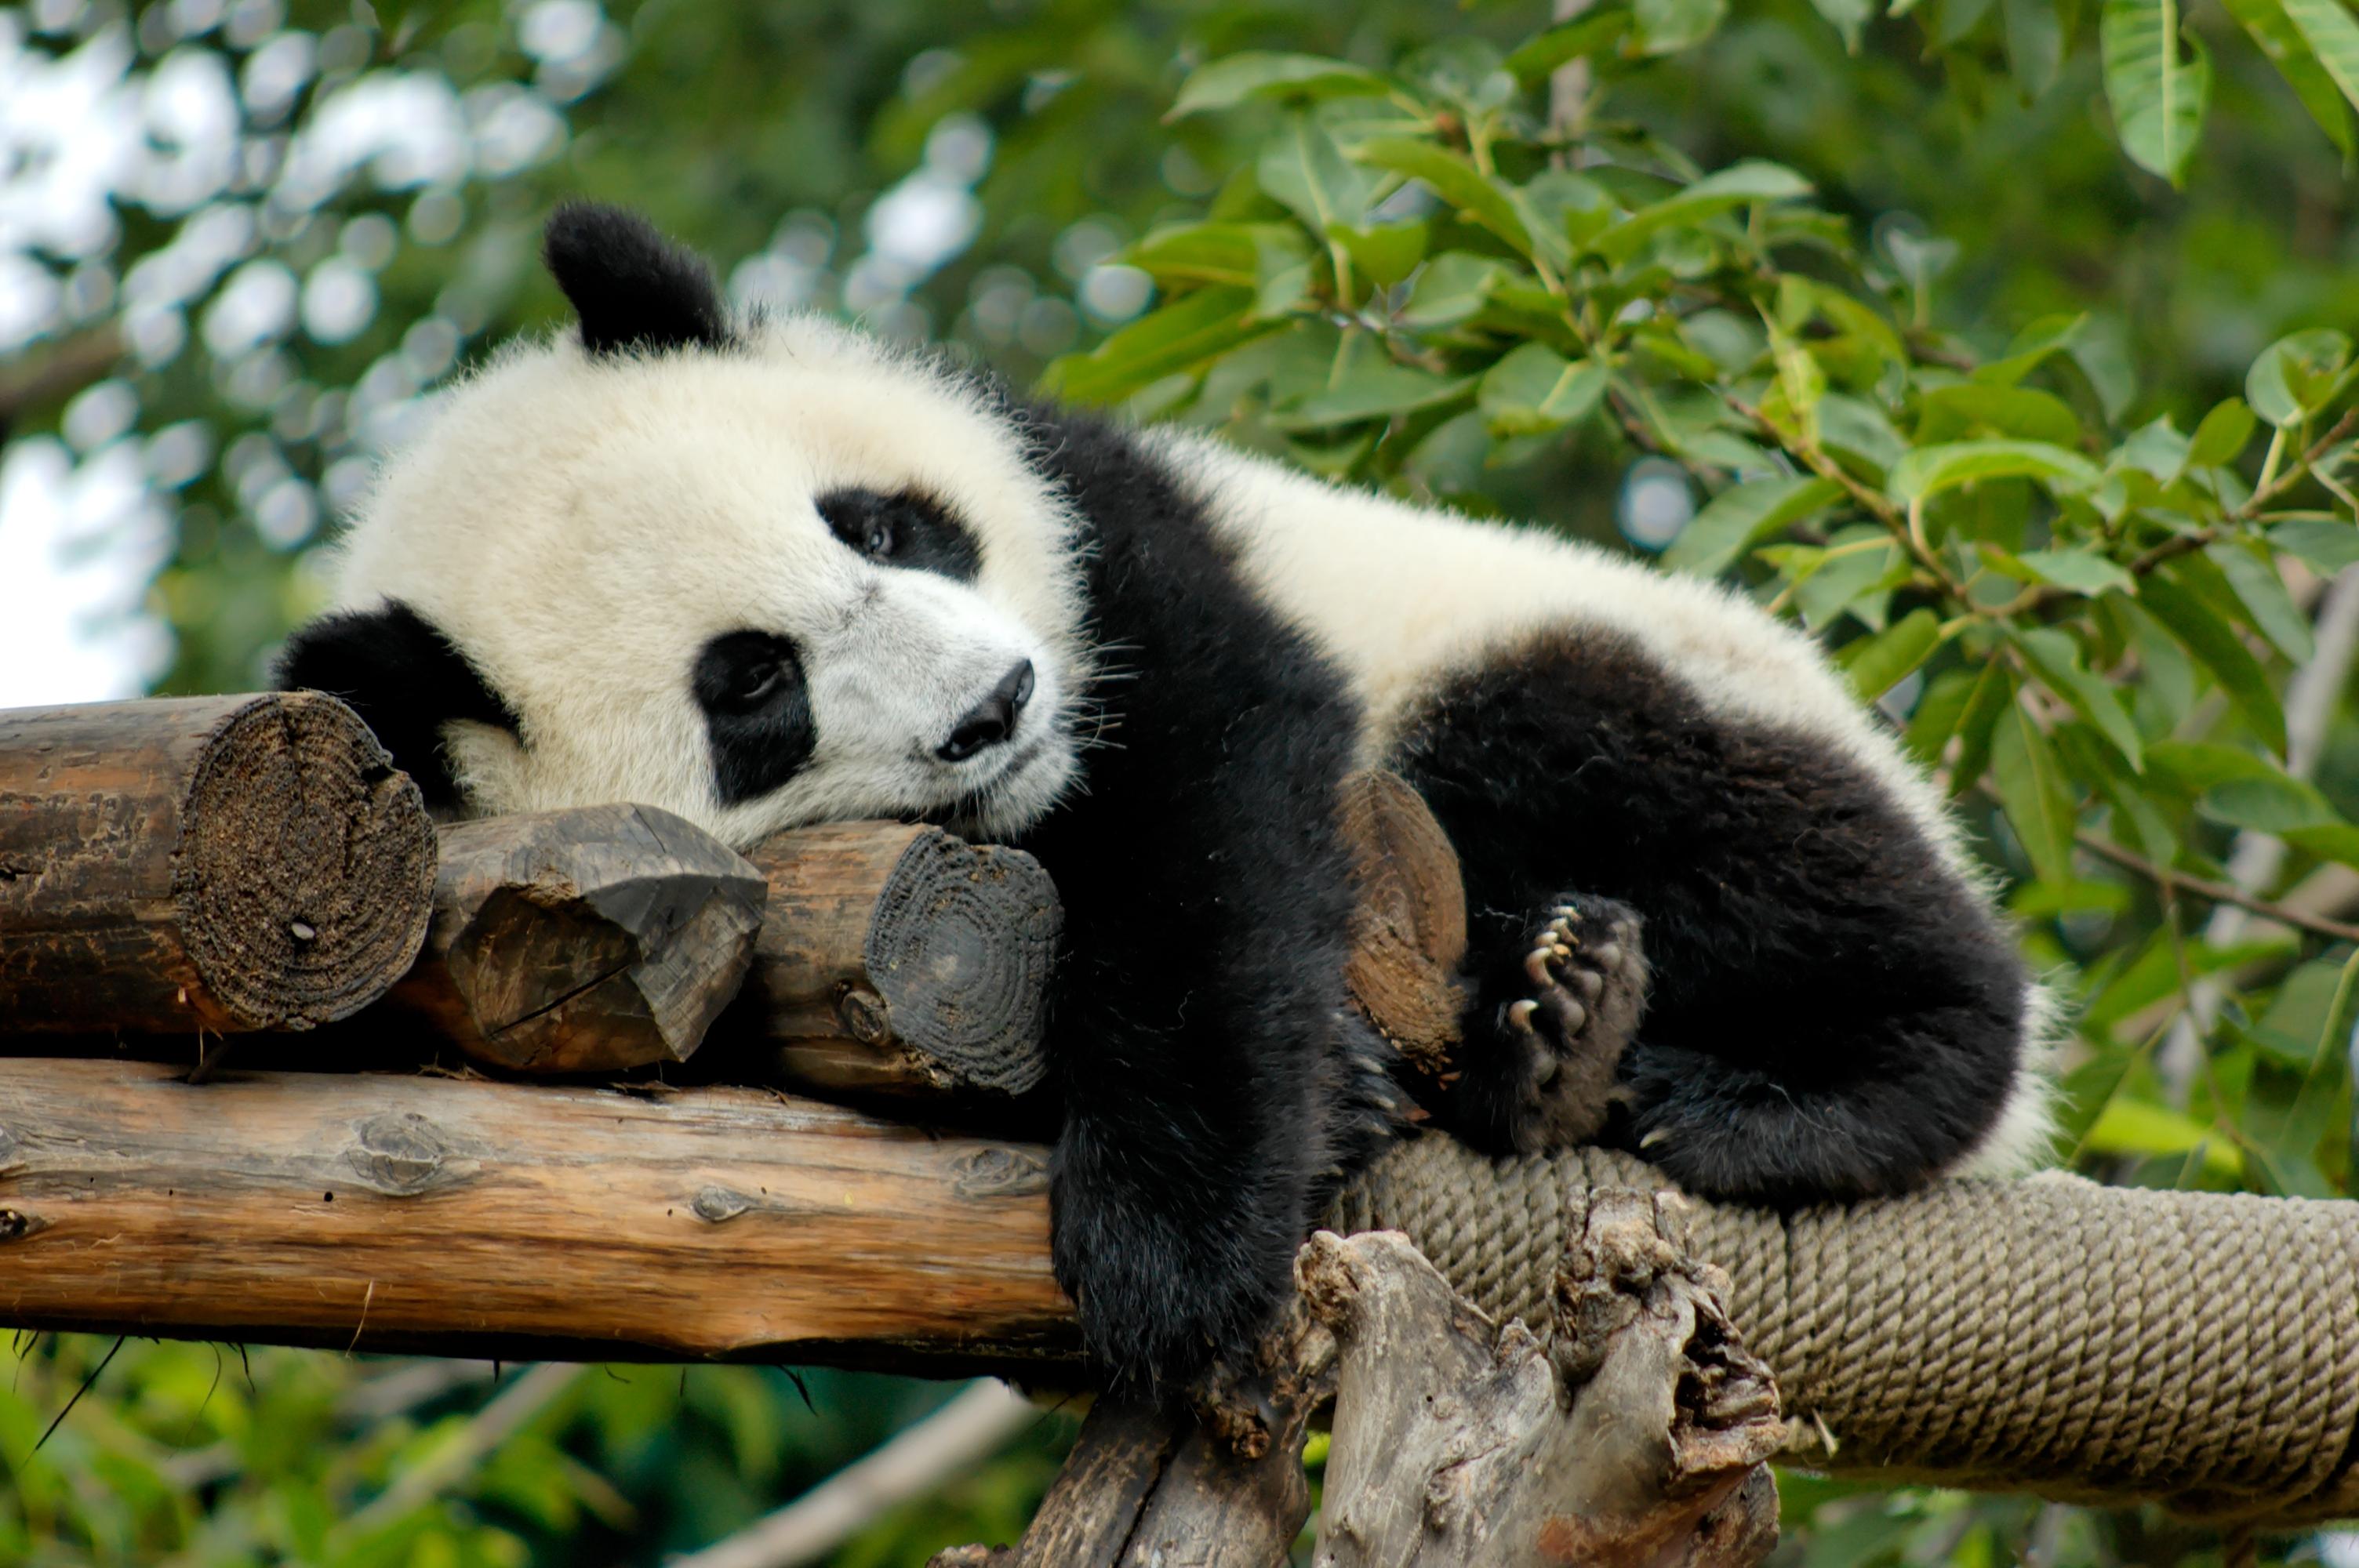 Panda Diplomacy: The World's Cutest Ambassadors - History ...